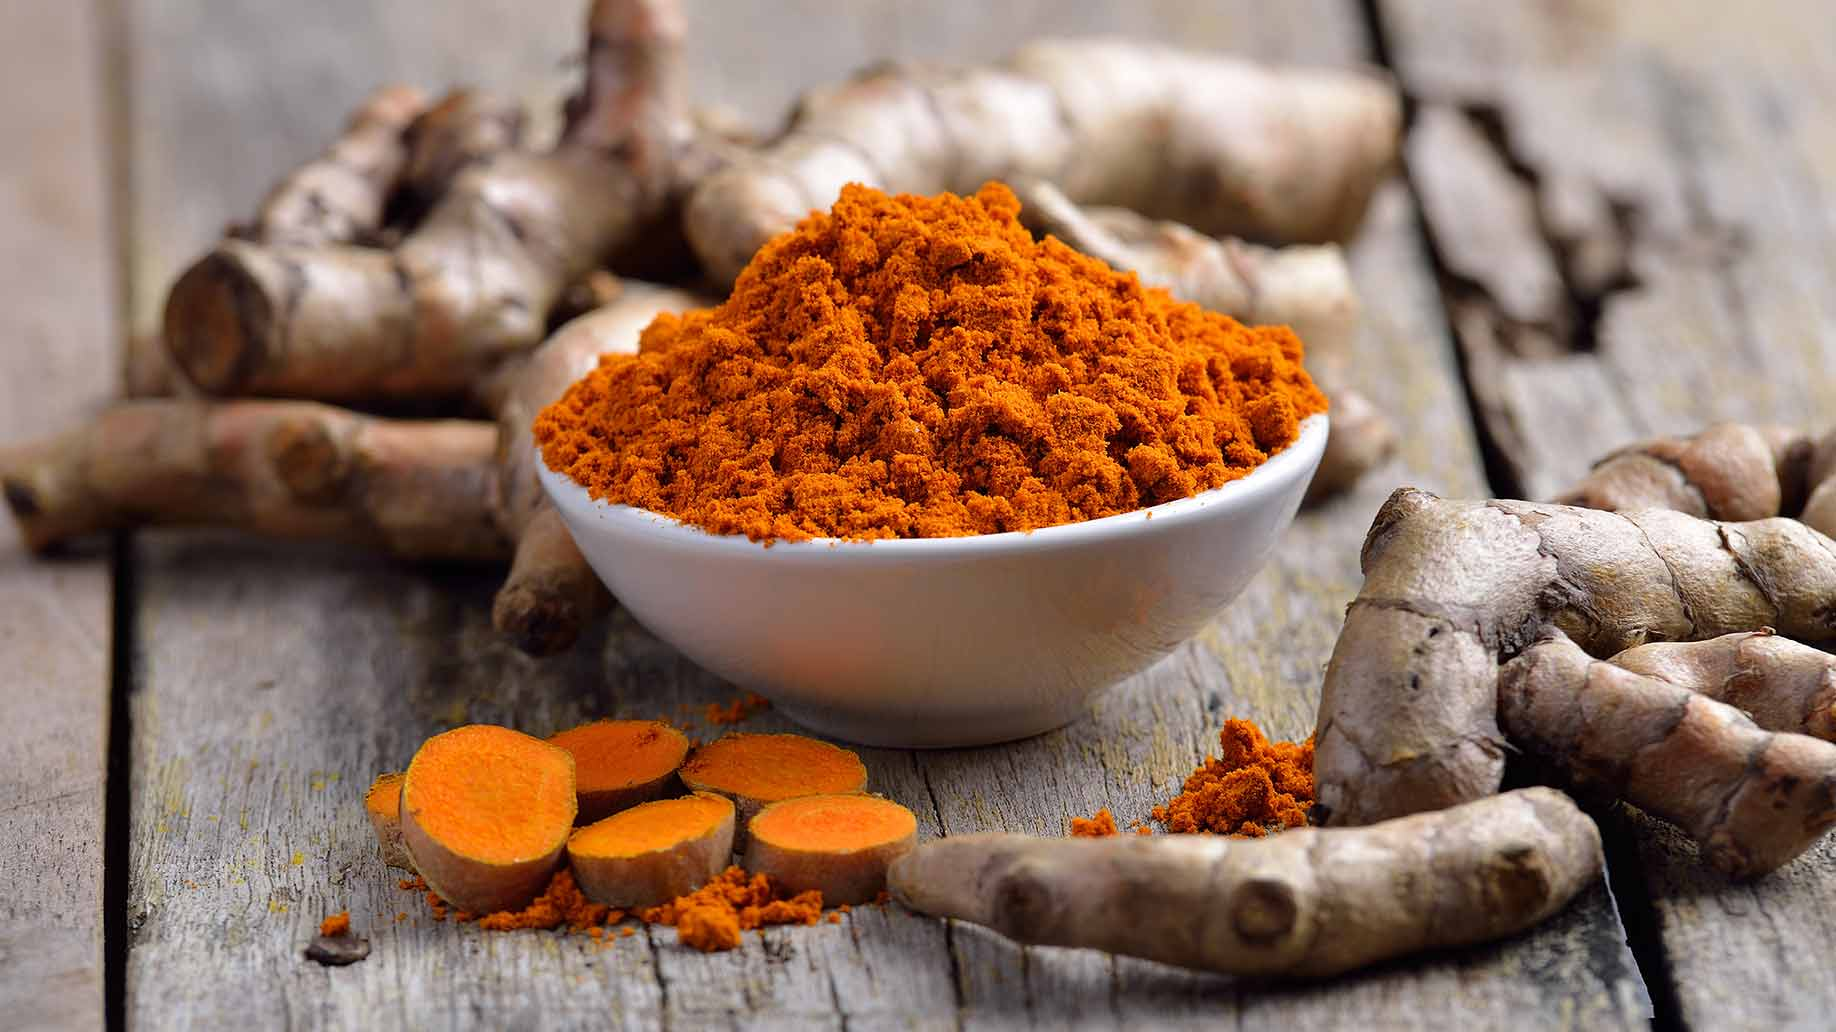 turmeric curcumin root orange powder arthritis natural remedies